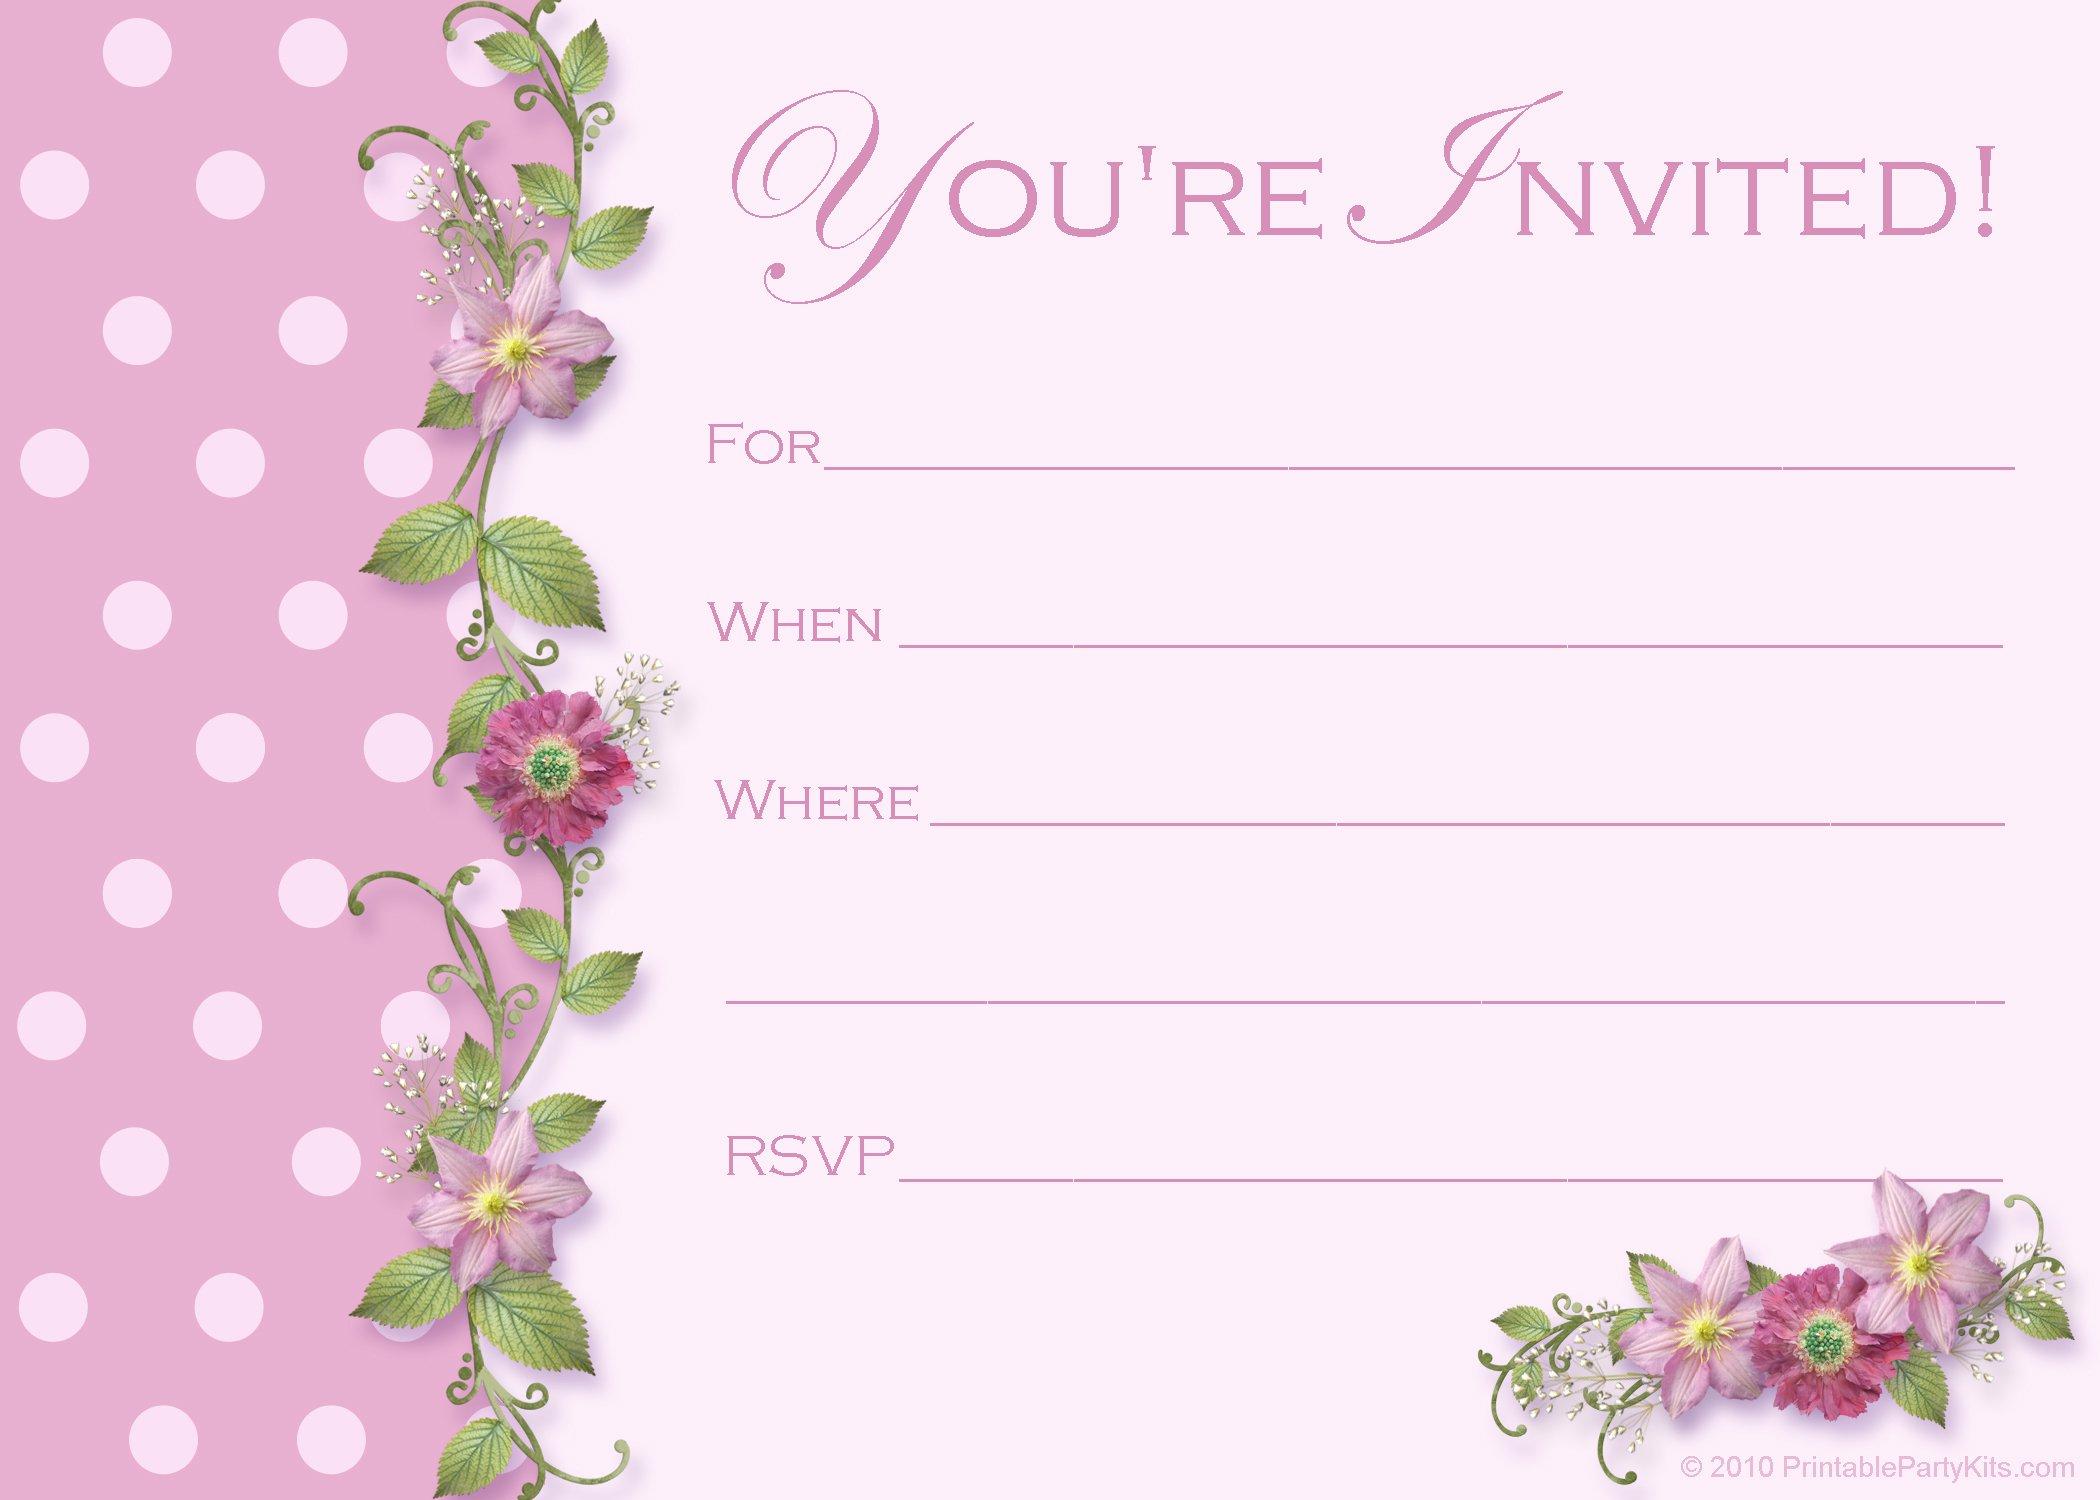 Sample Party Invitation Templates Free